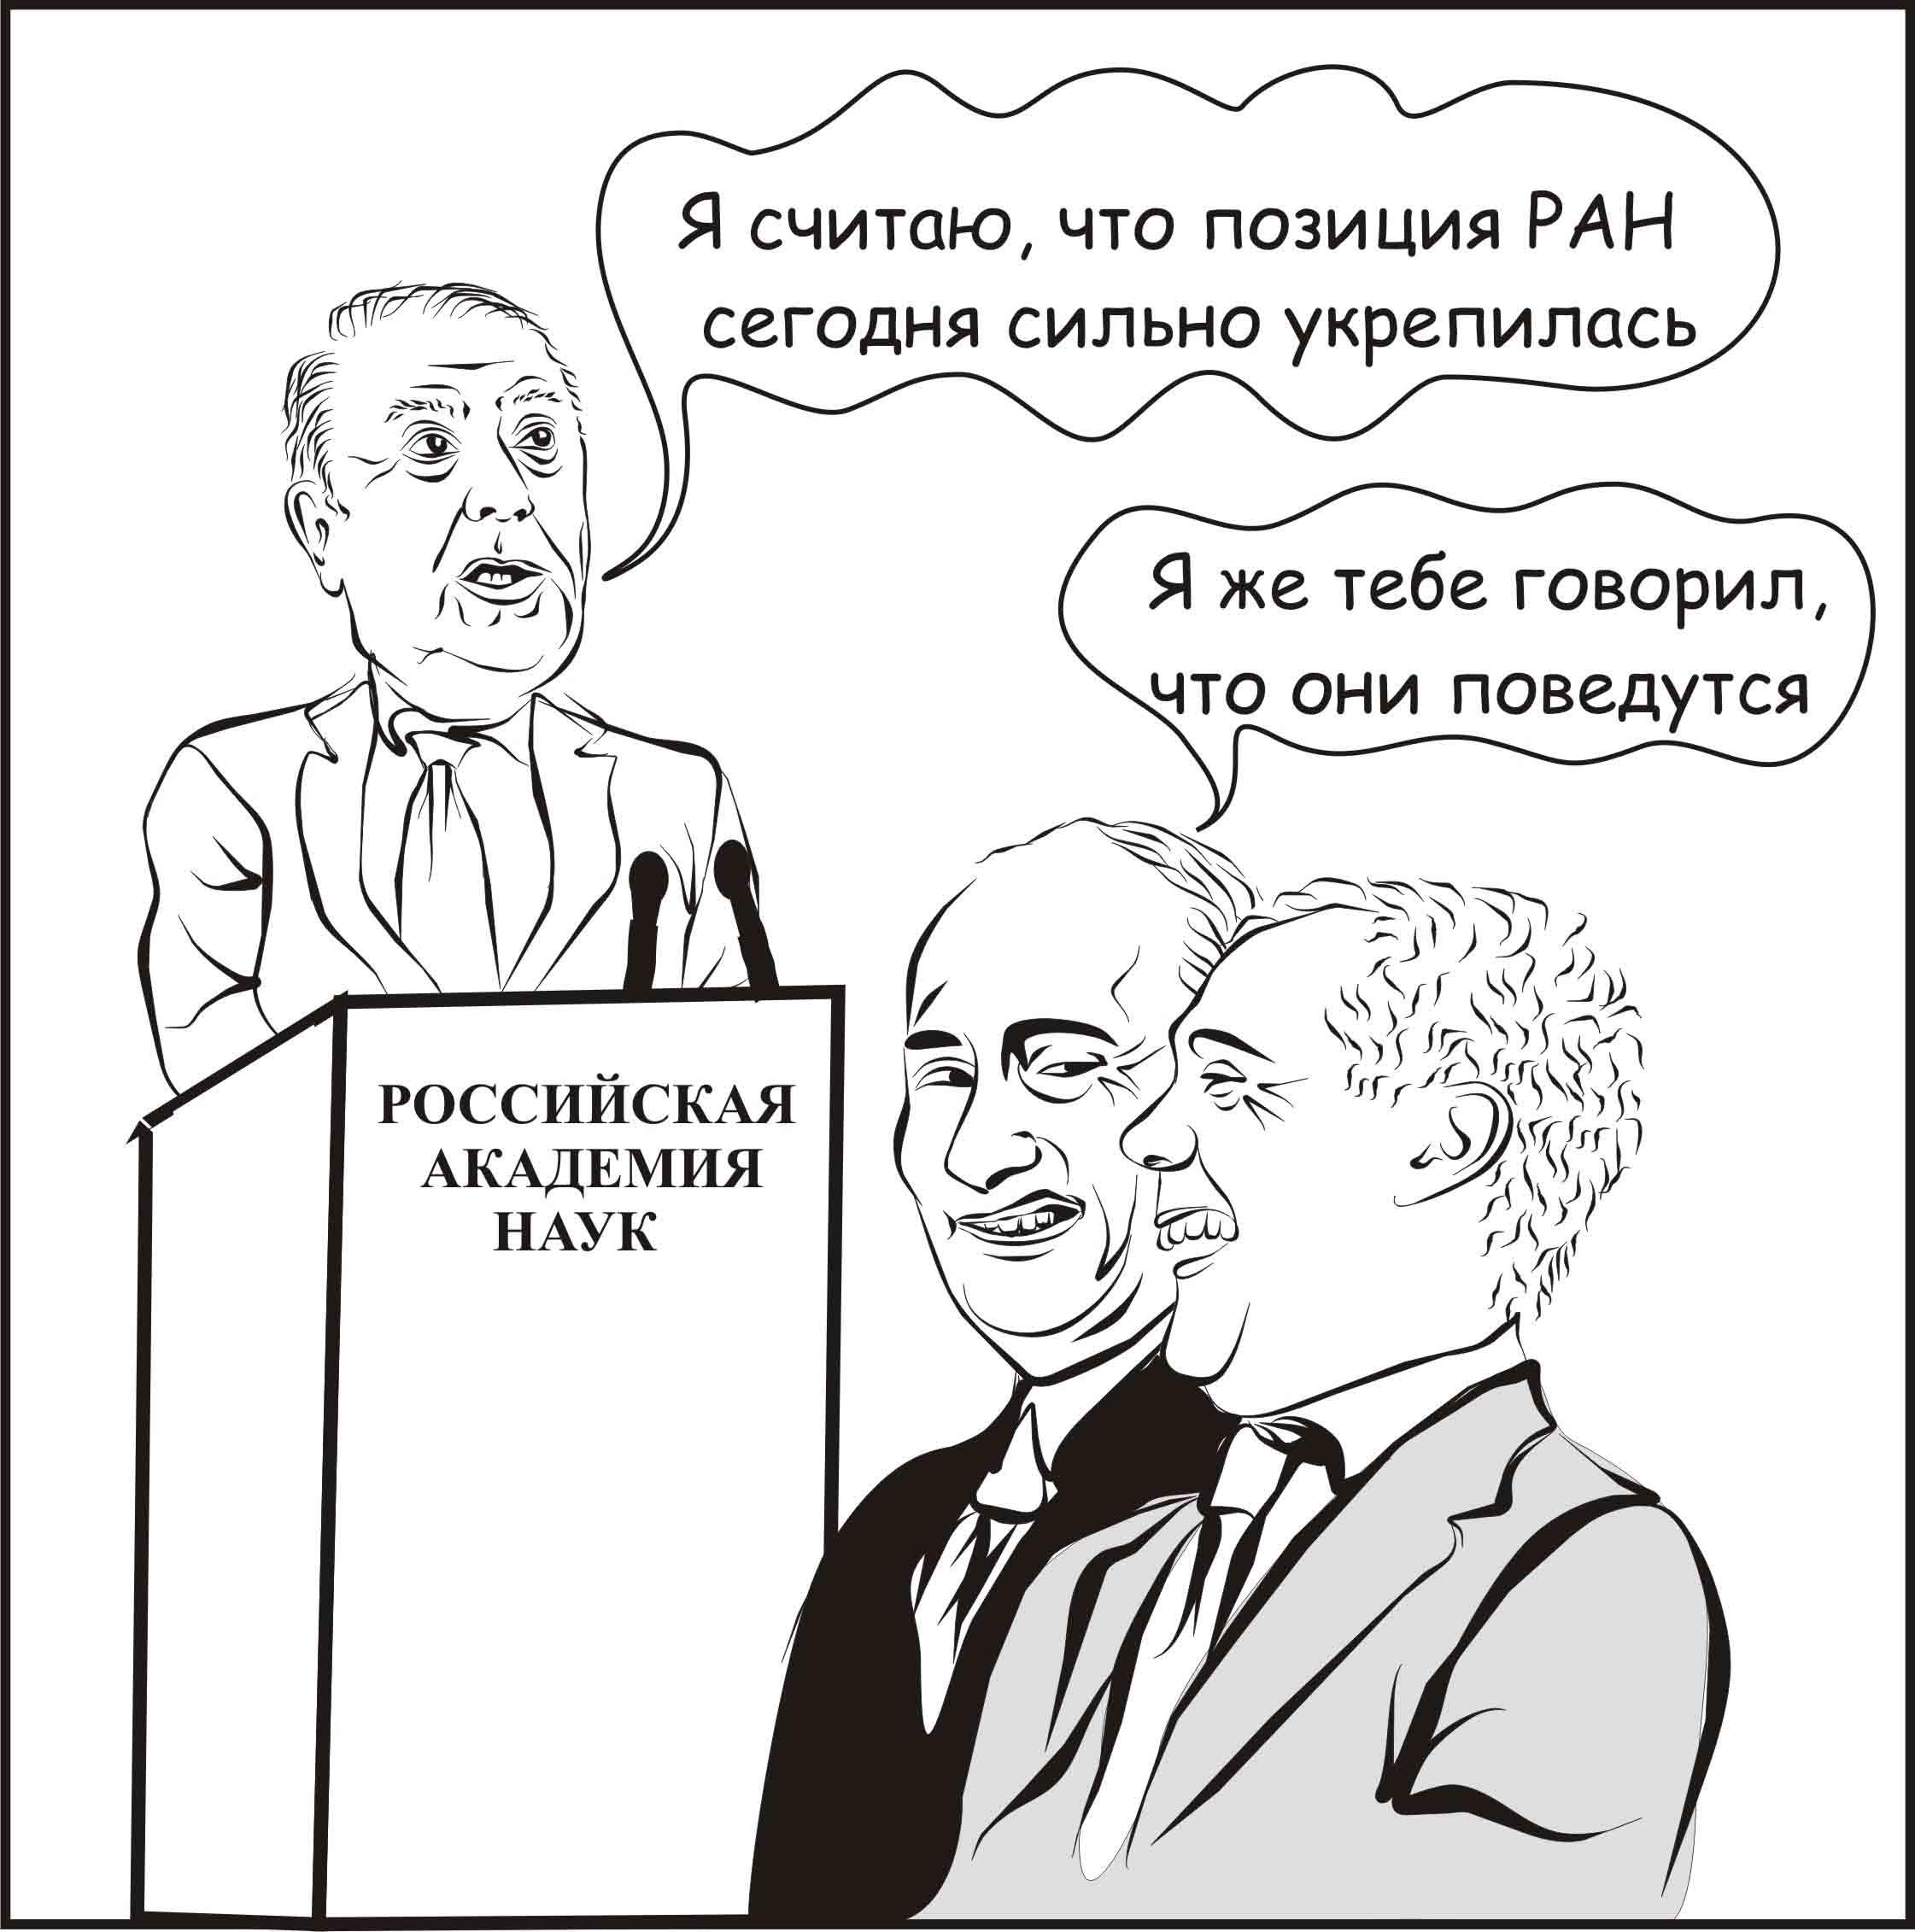 ФортовПутинМедведев